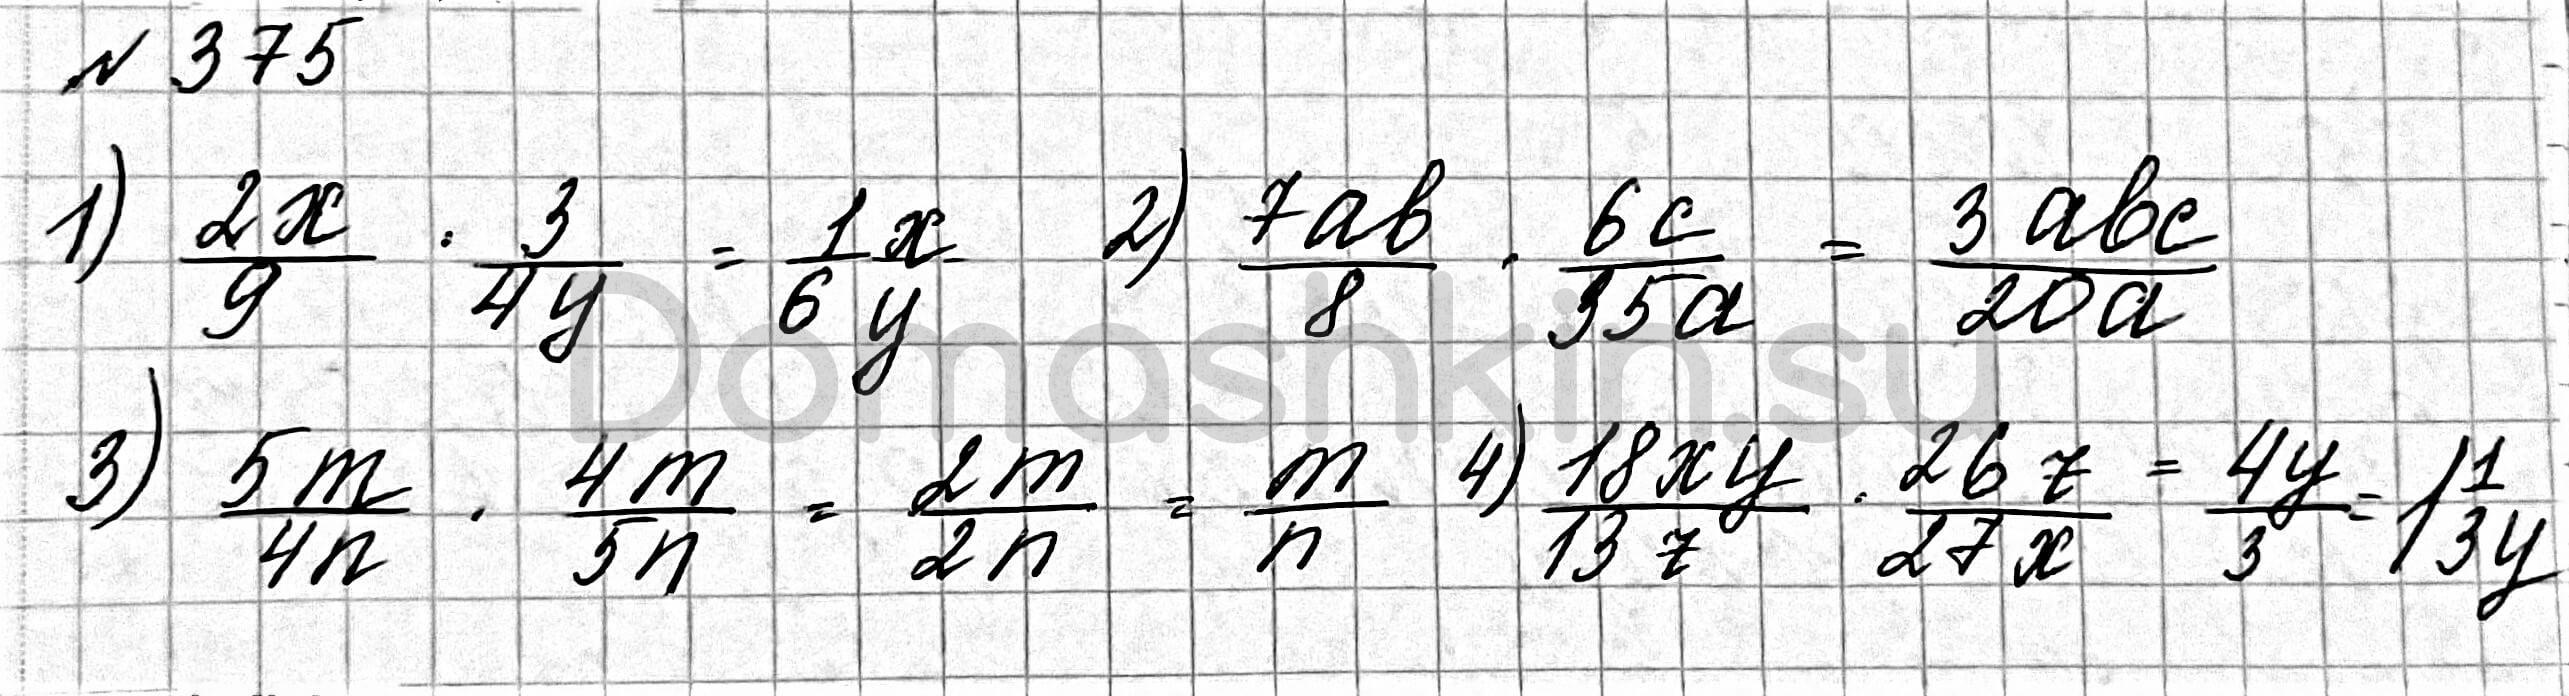 Математика 6 класс учебник Мерзляк номер 375 решение